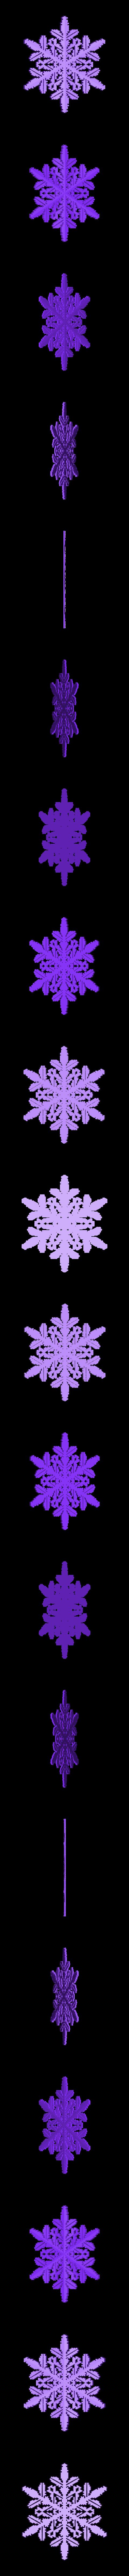 r40-rg1.stl Download free STL file Snowflake growth simulation in BlocksCAD • 3D printing design, arpruss